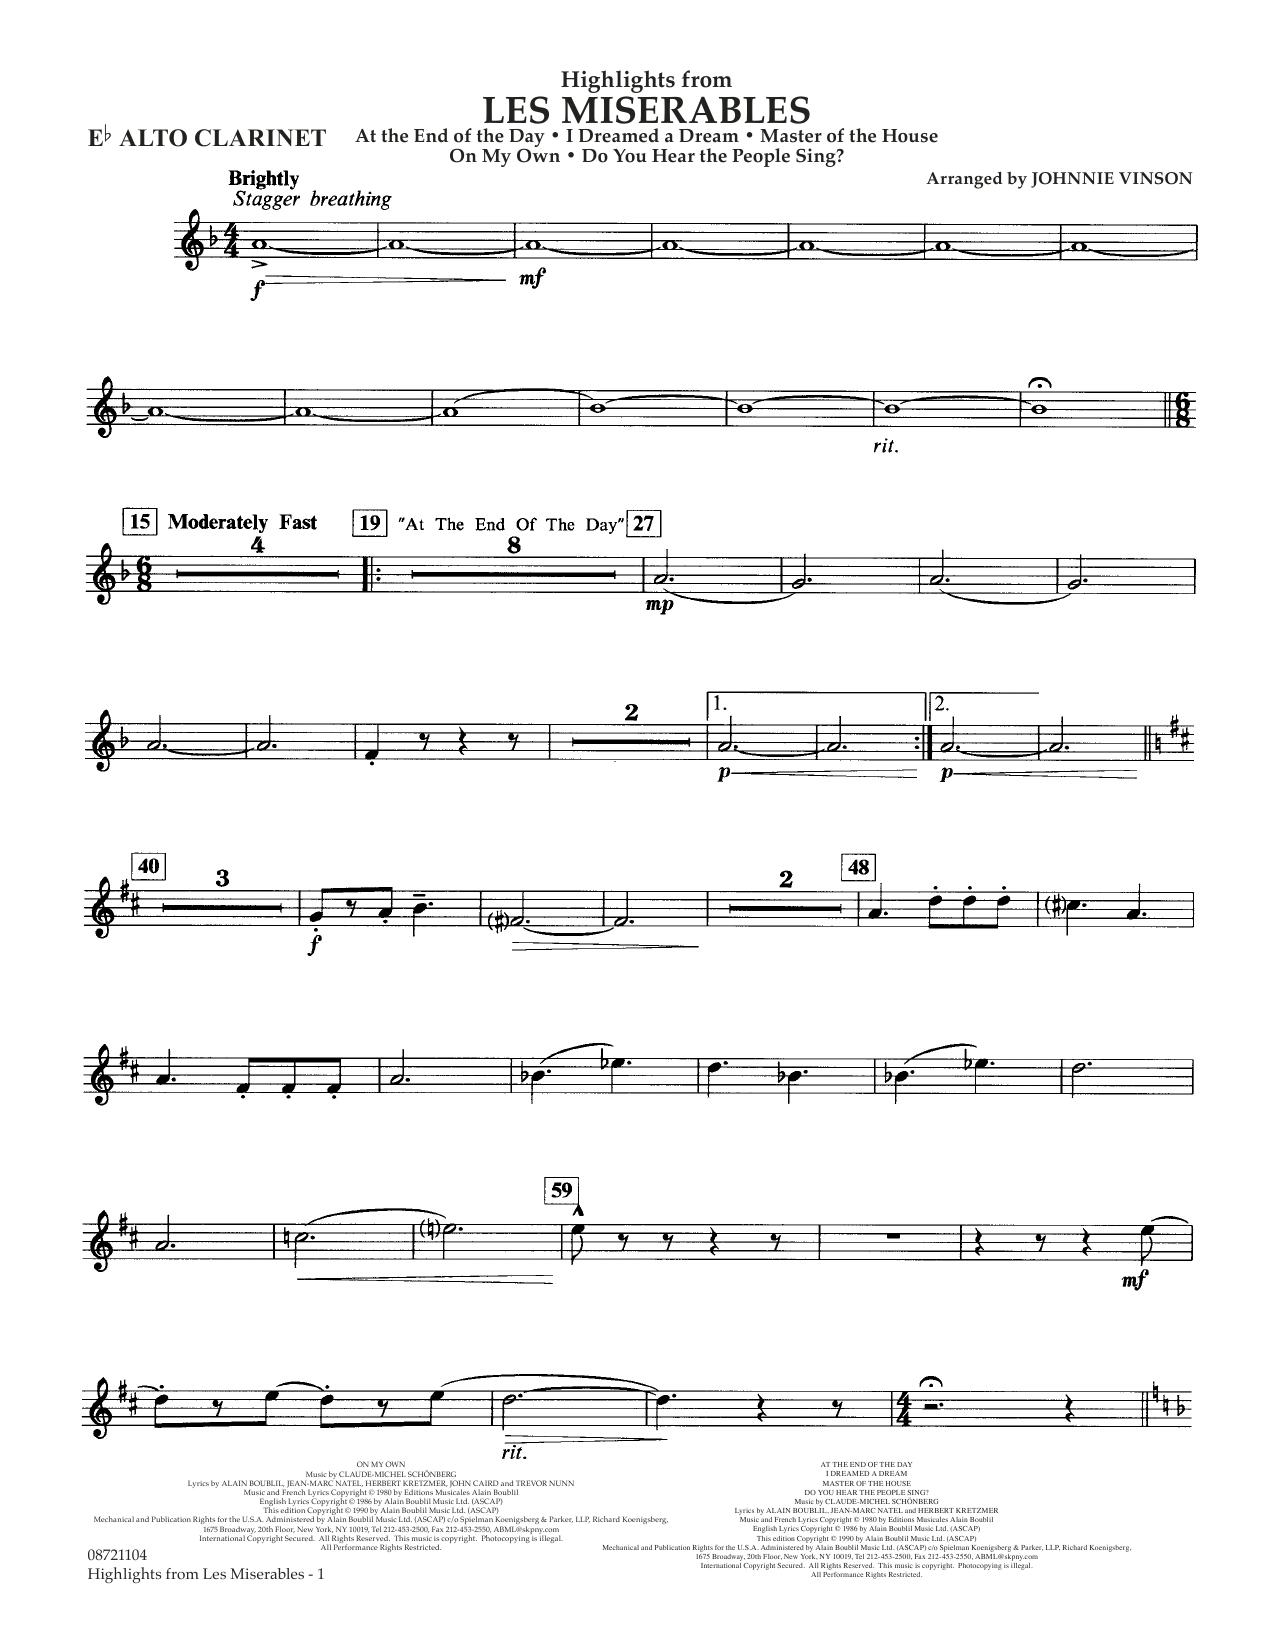 Highlights from Les Misérables (arr. Johnnie Vinson) - Eb Alto Clarinet (Concert Band)